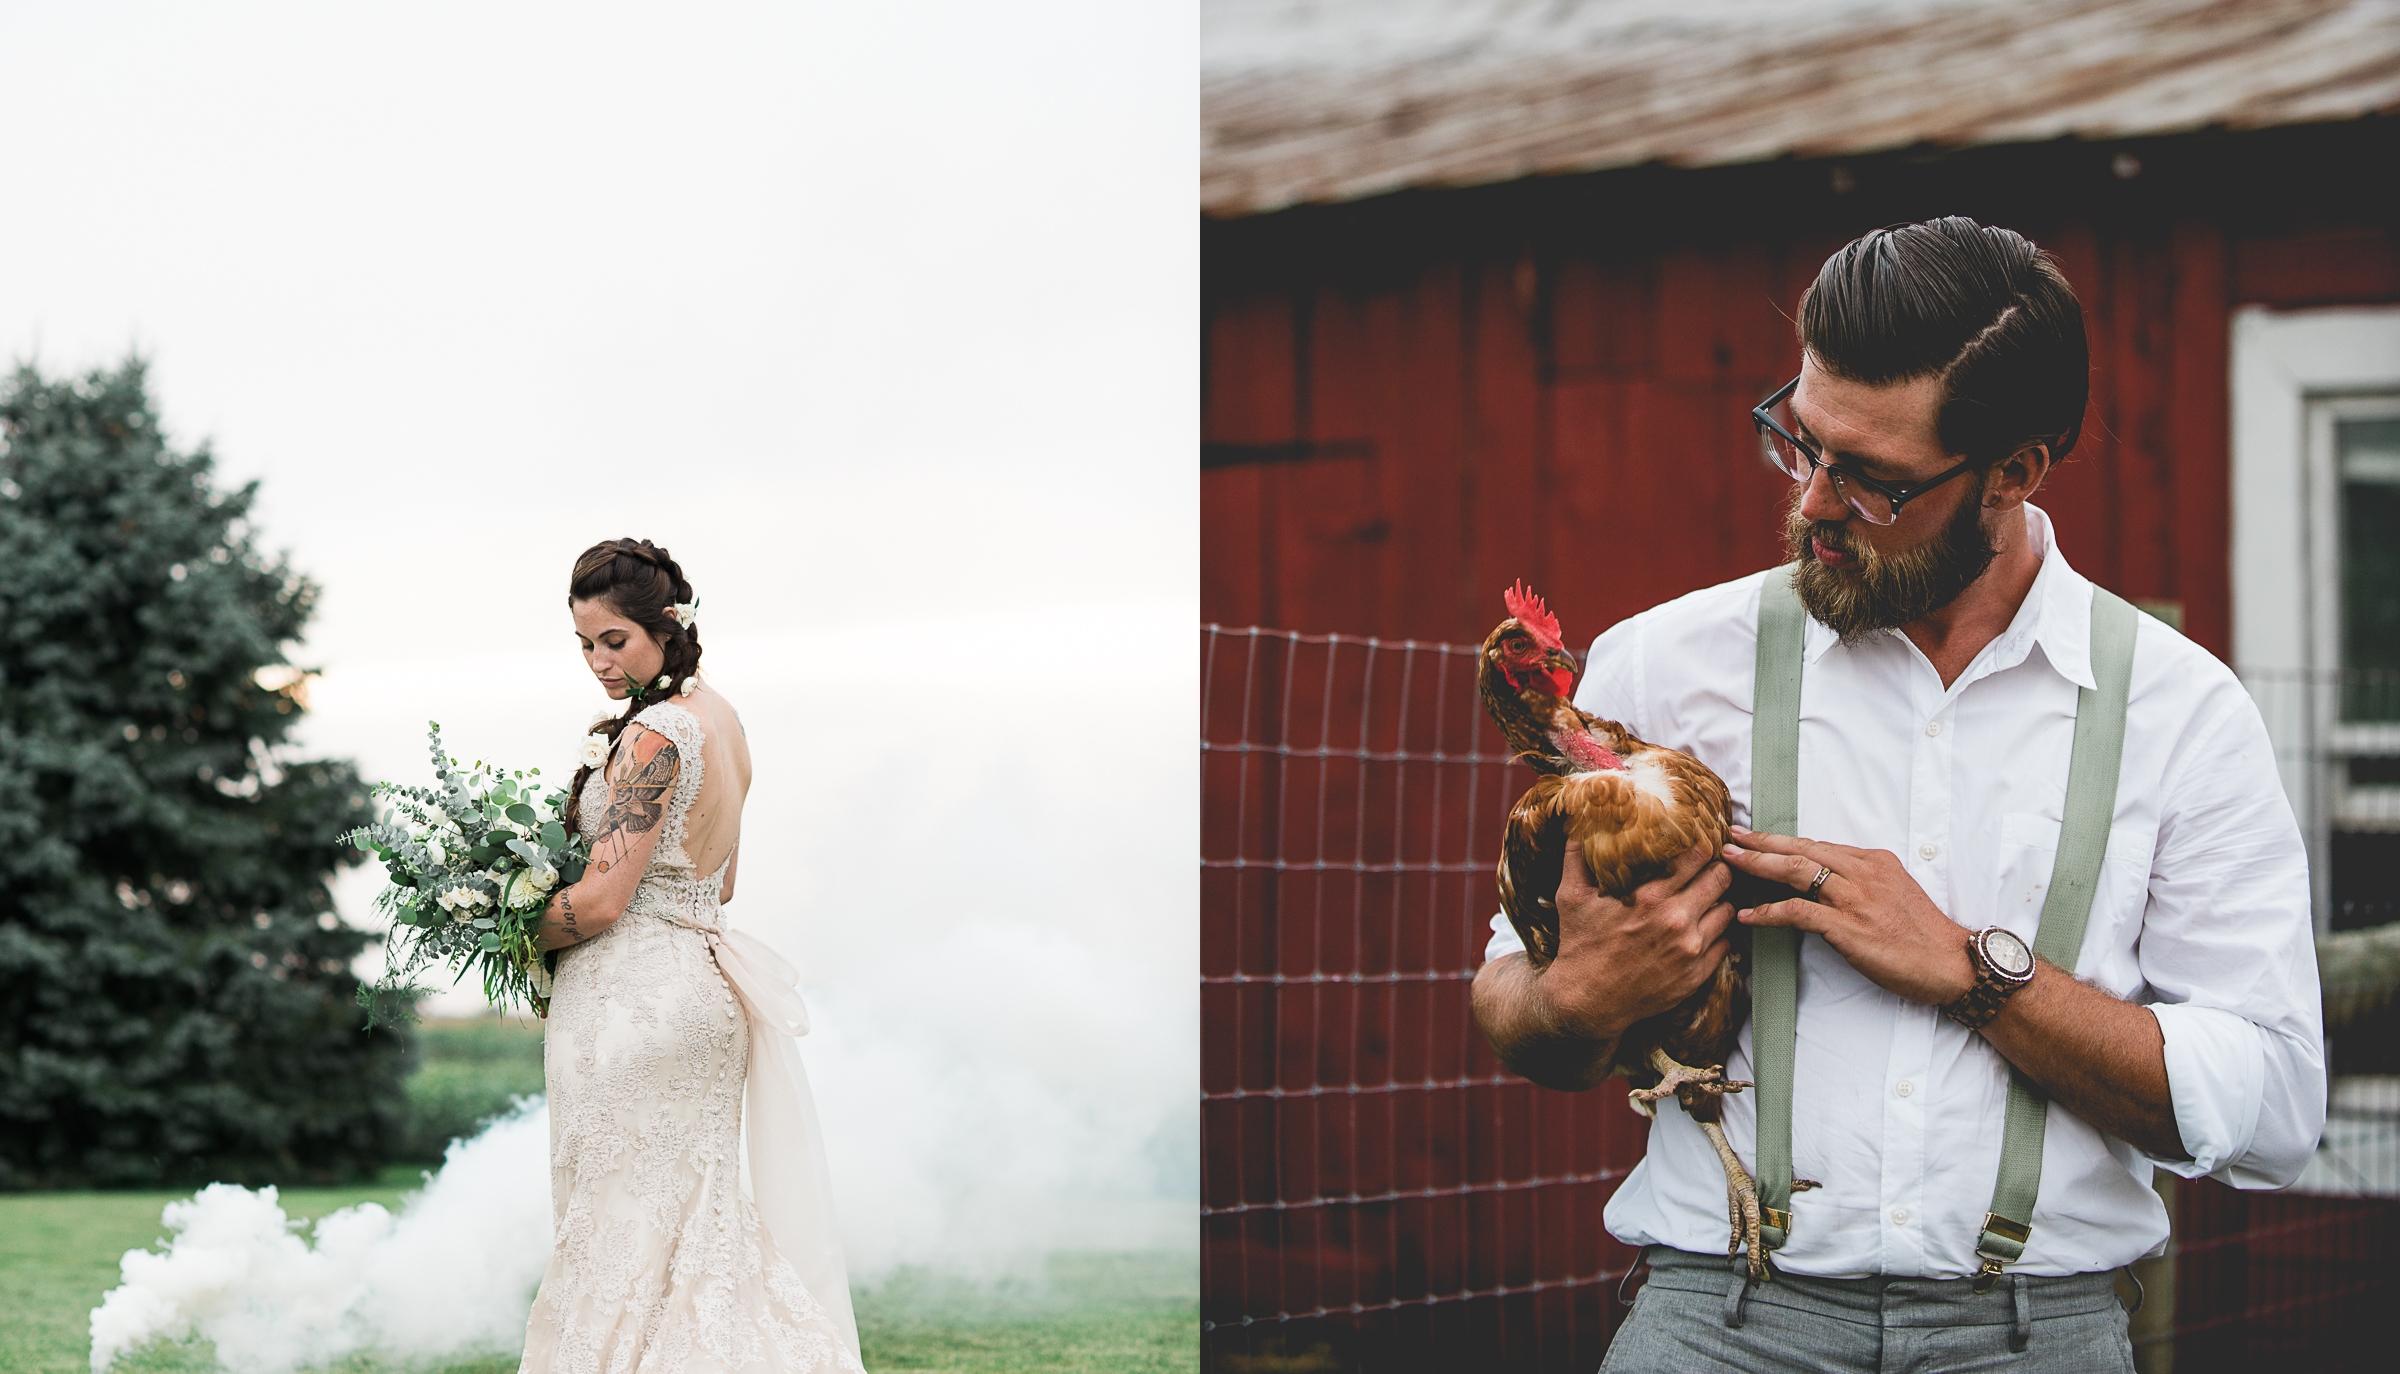 Boho Bride and Groom Portrait By Brett Loves Elle Photography, Columbus Wedding Photographers.